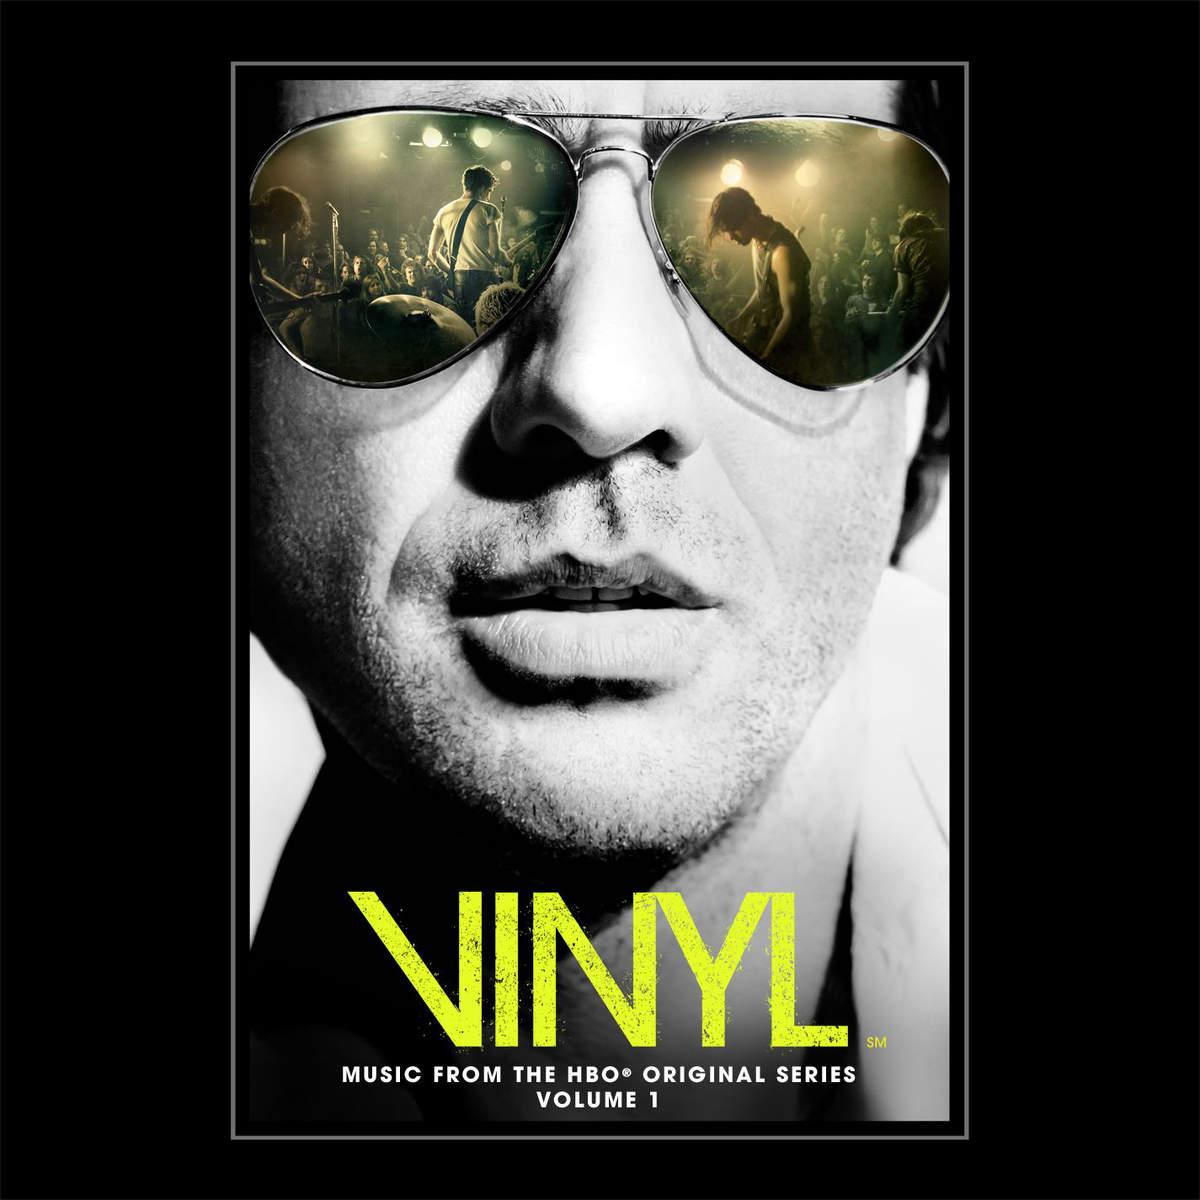 Vinyl Soundtrack De La Serie De Hbo Series De Televisi 243 N